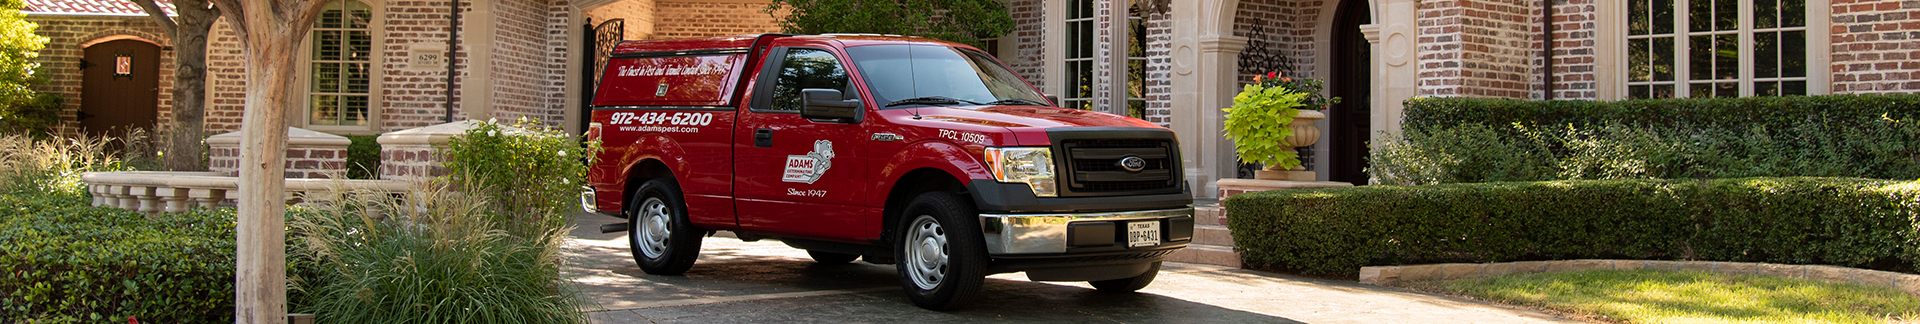 adams pest control's truck in mckinney tx